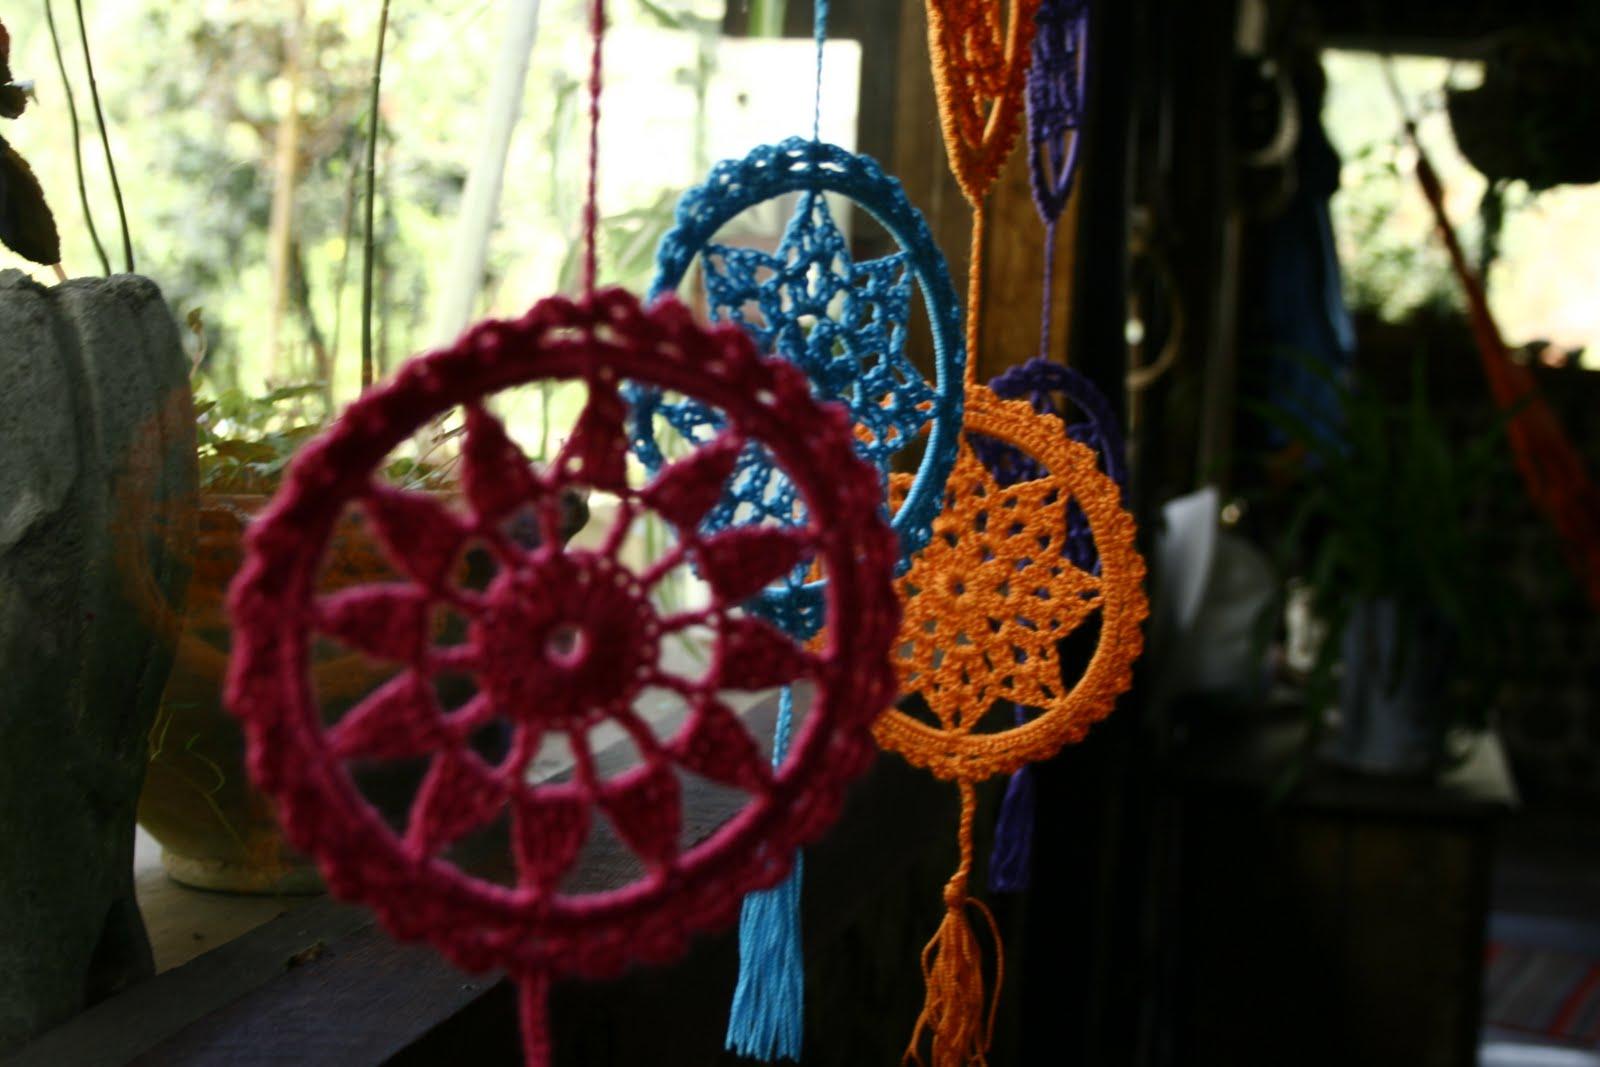 justiniana reyna deco crochet. Black Bedroom Furniture Sets. Home Design Ideas